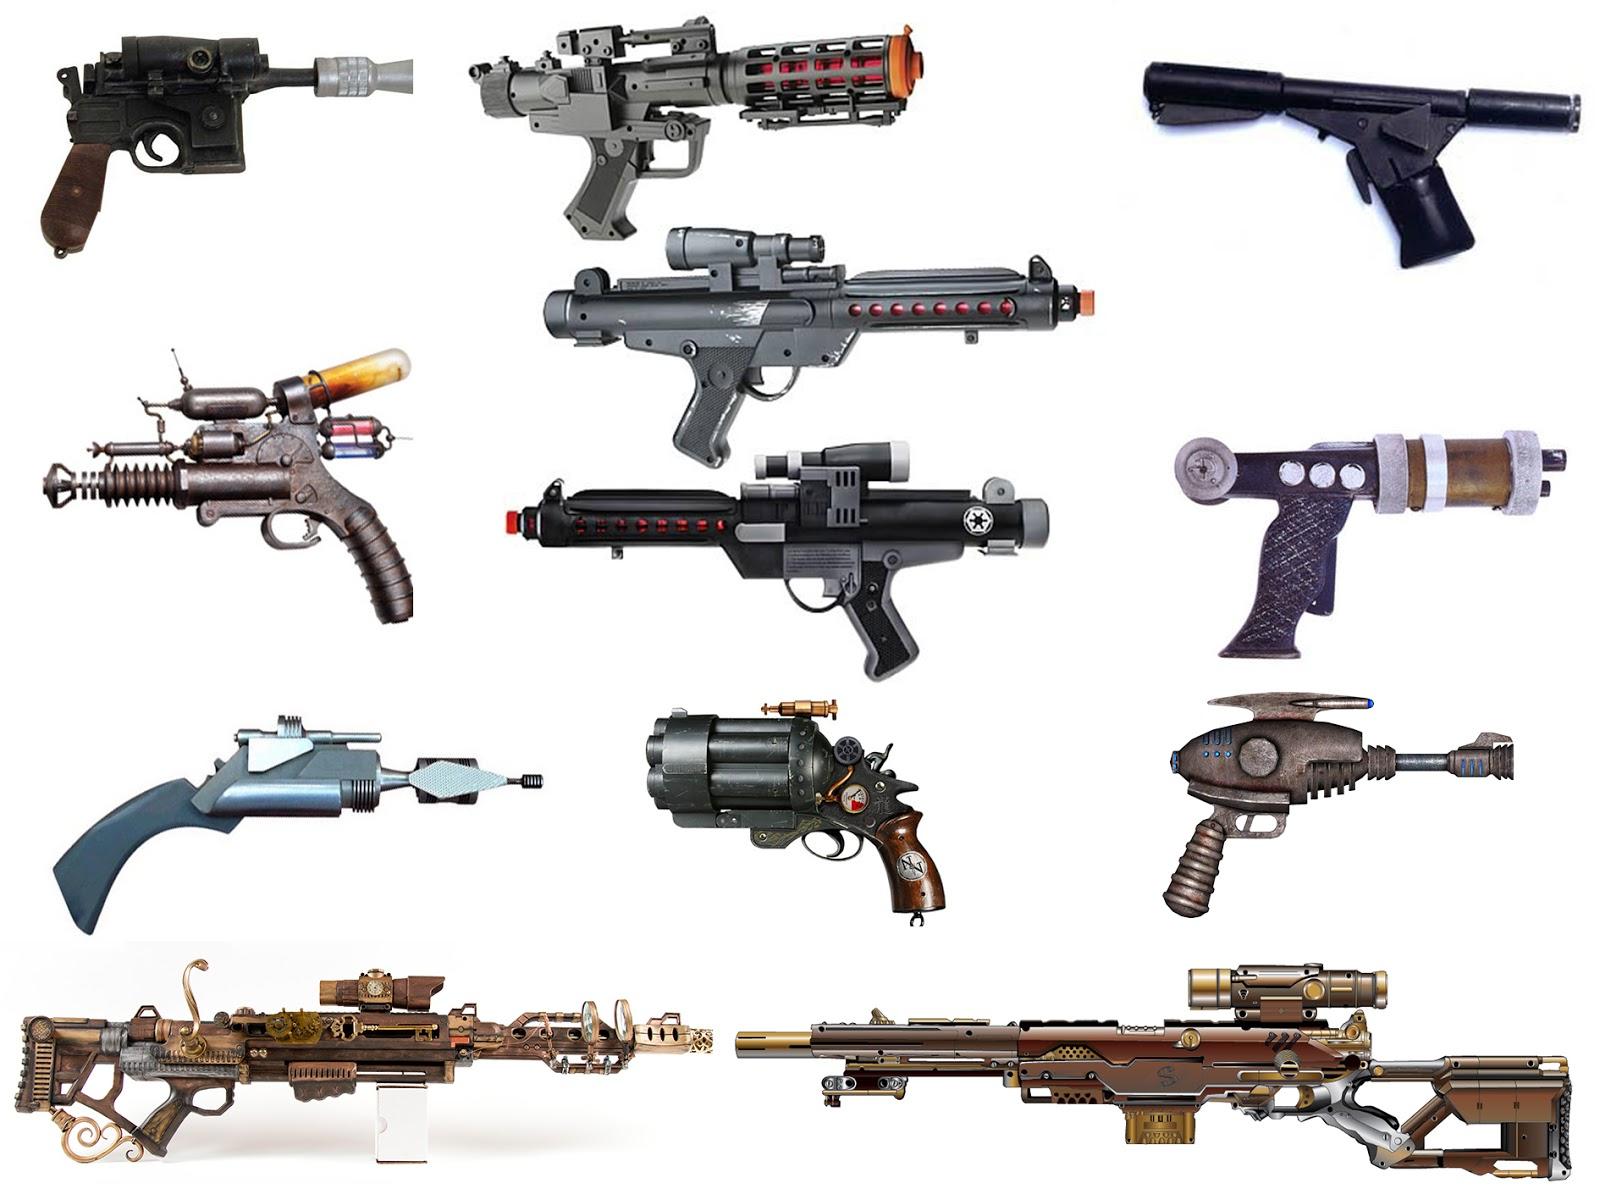 Hayden Wakeling Gaming: Futuristic Gun Designs